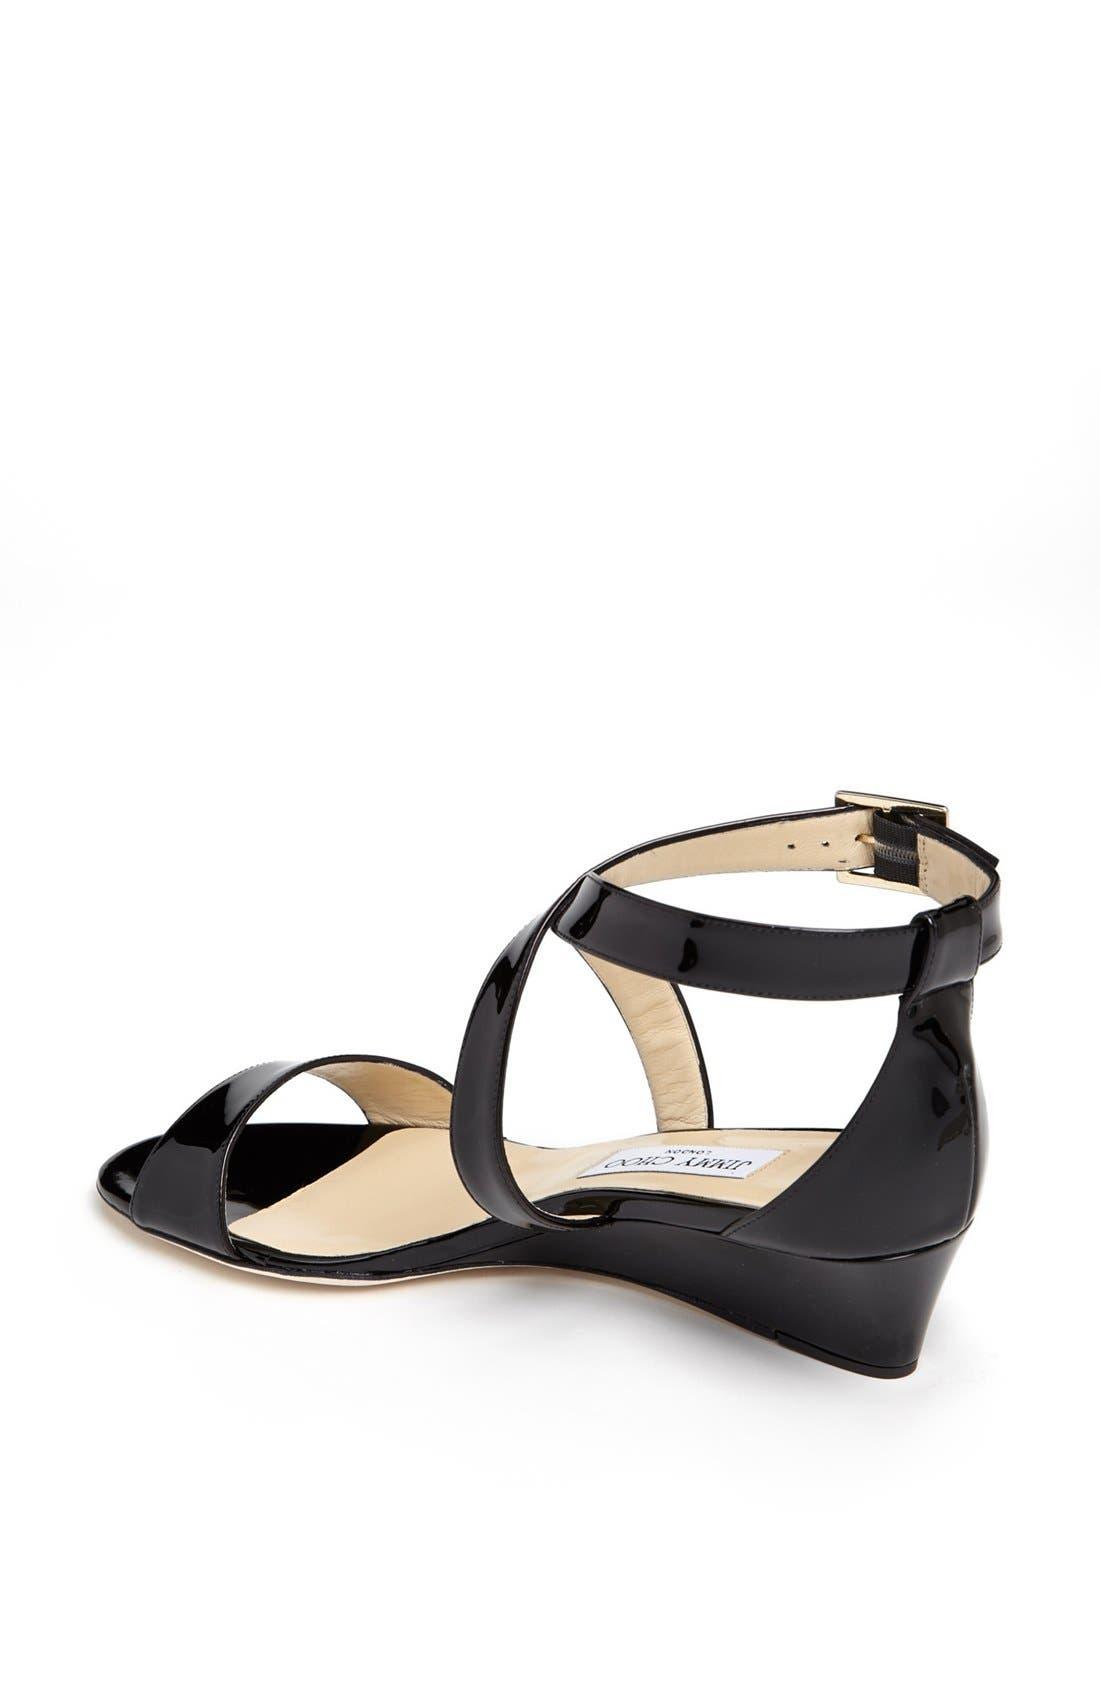 Alternate Image 2  - Jimmy Choo 'Chiara' Strap Wedge Sandal (Women)